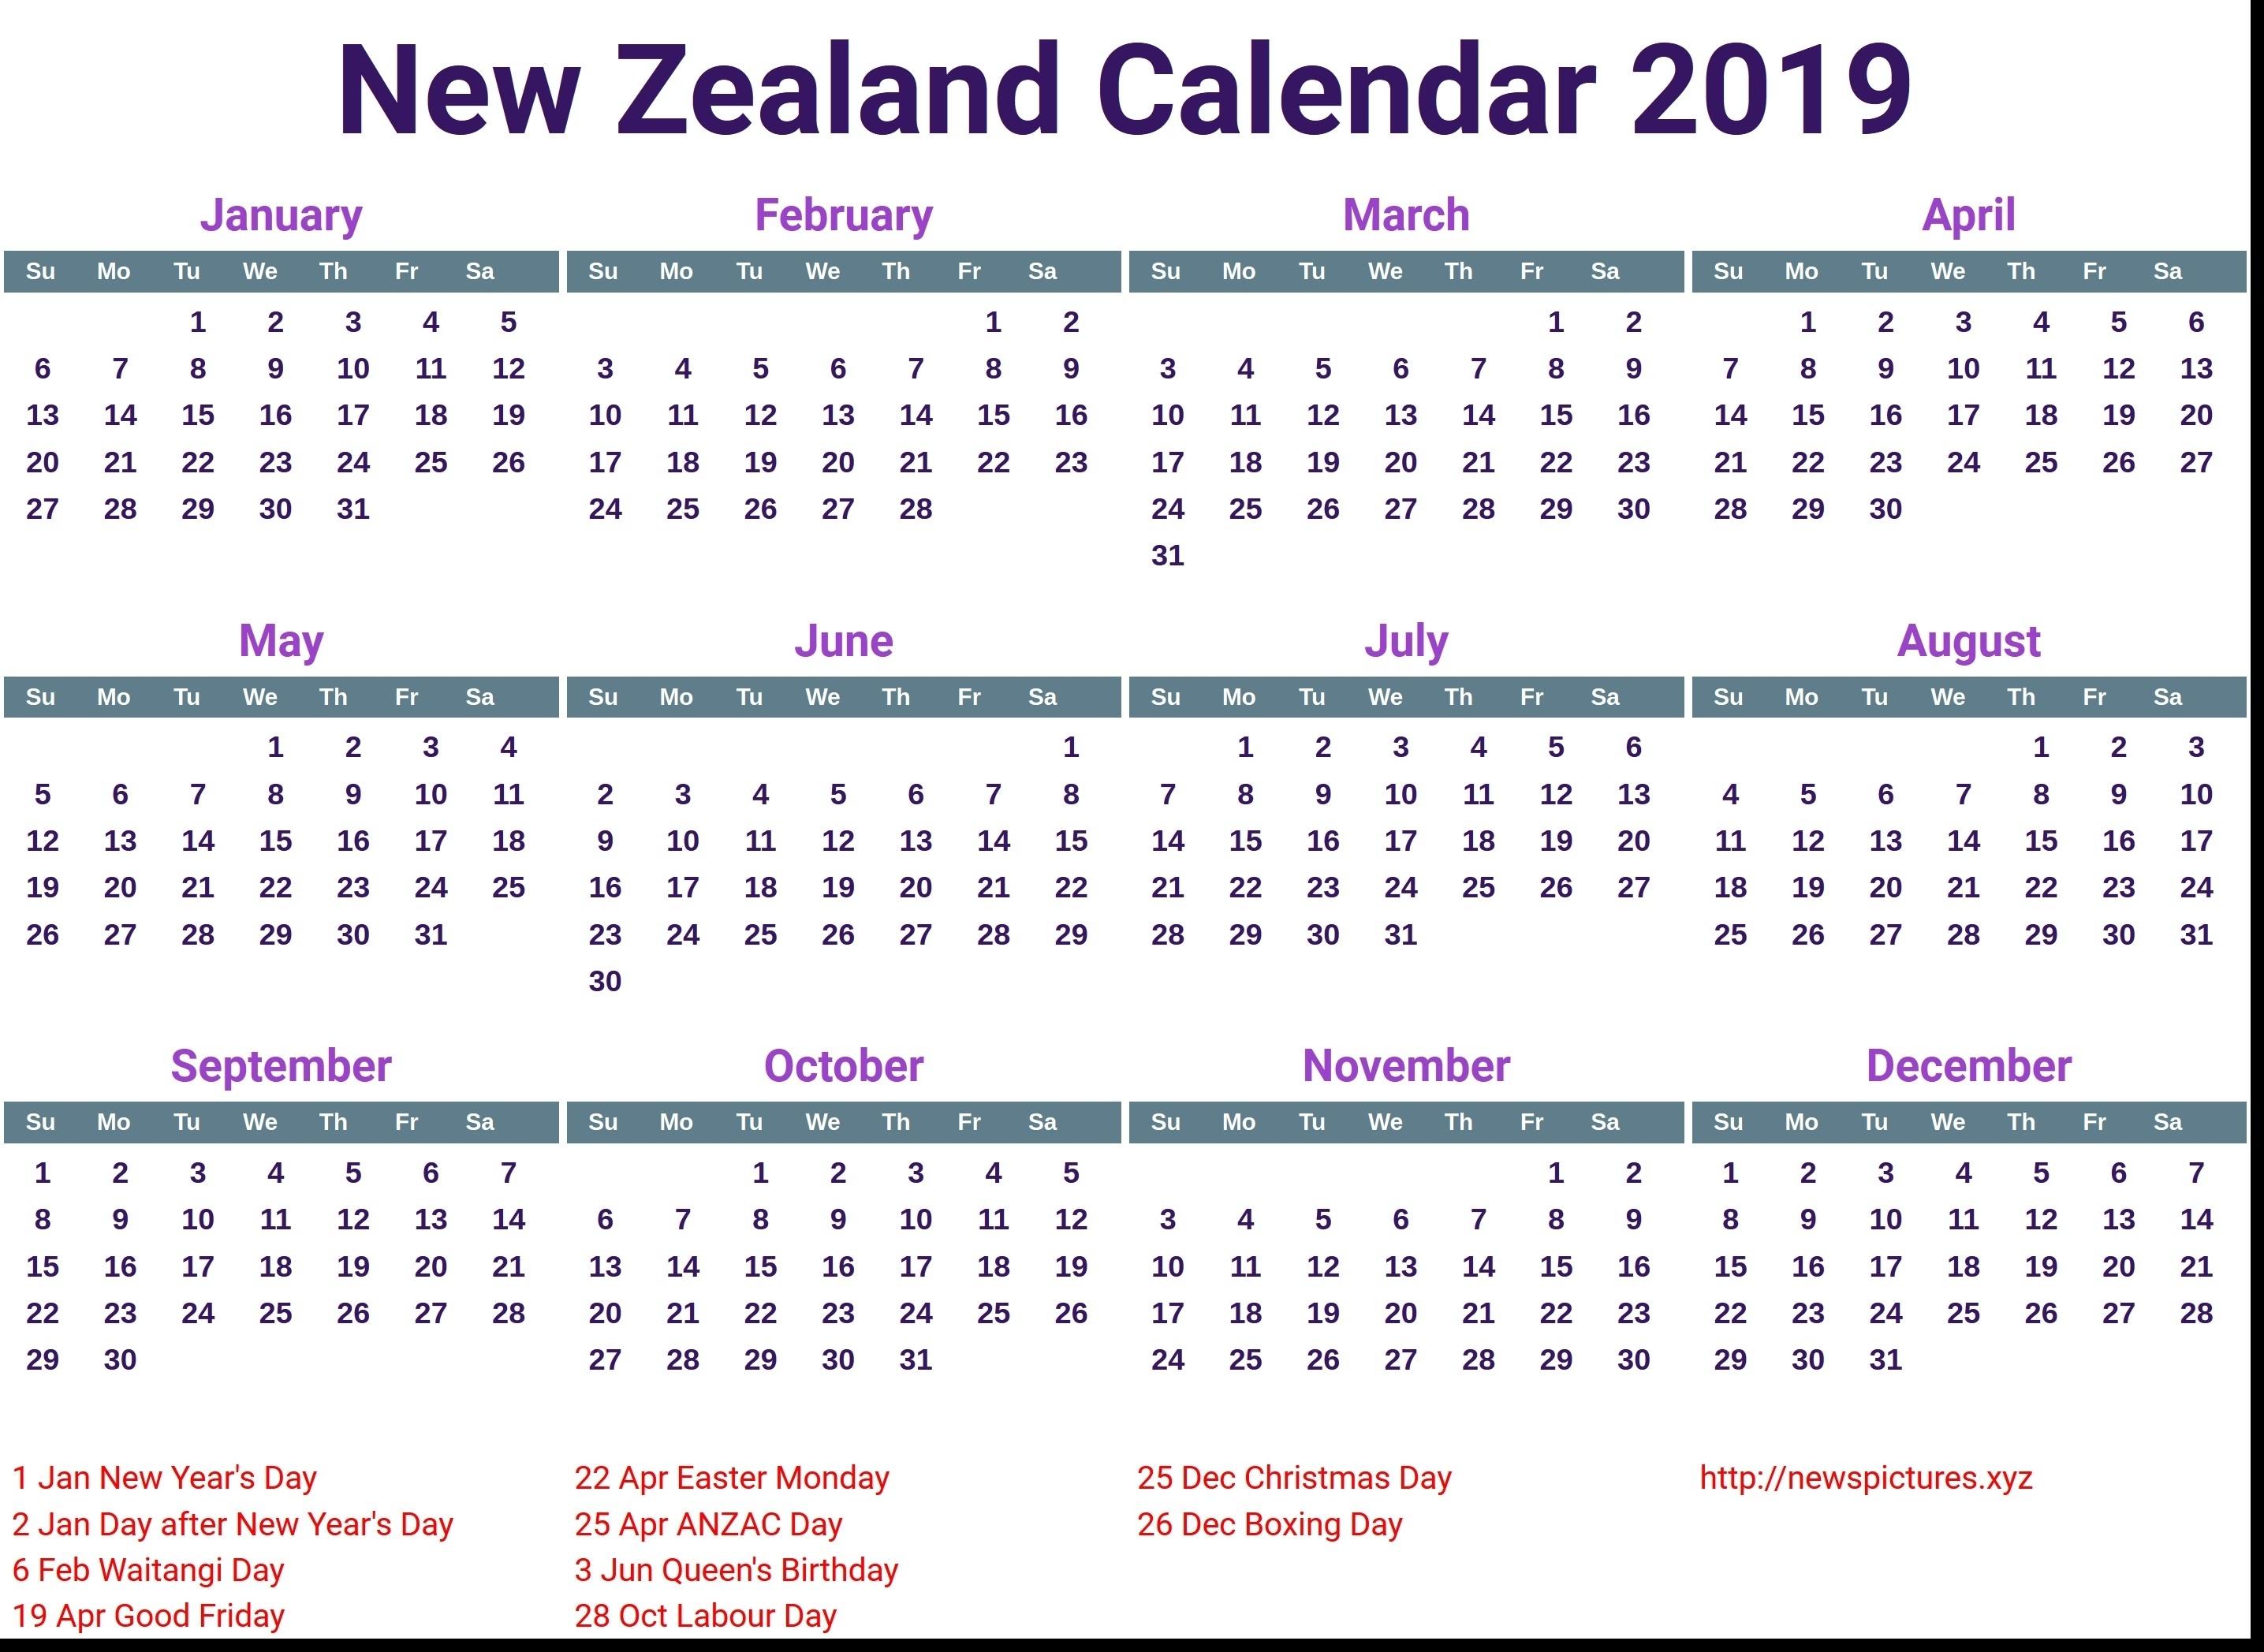 2018 Nz School Holidays 2017 | Venture Inspire-School Holidays Nz Calendar